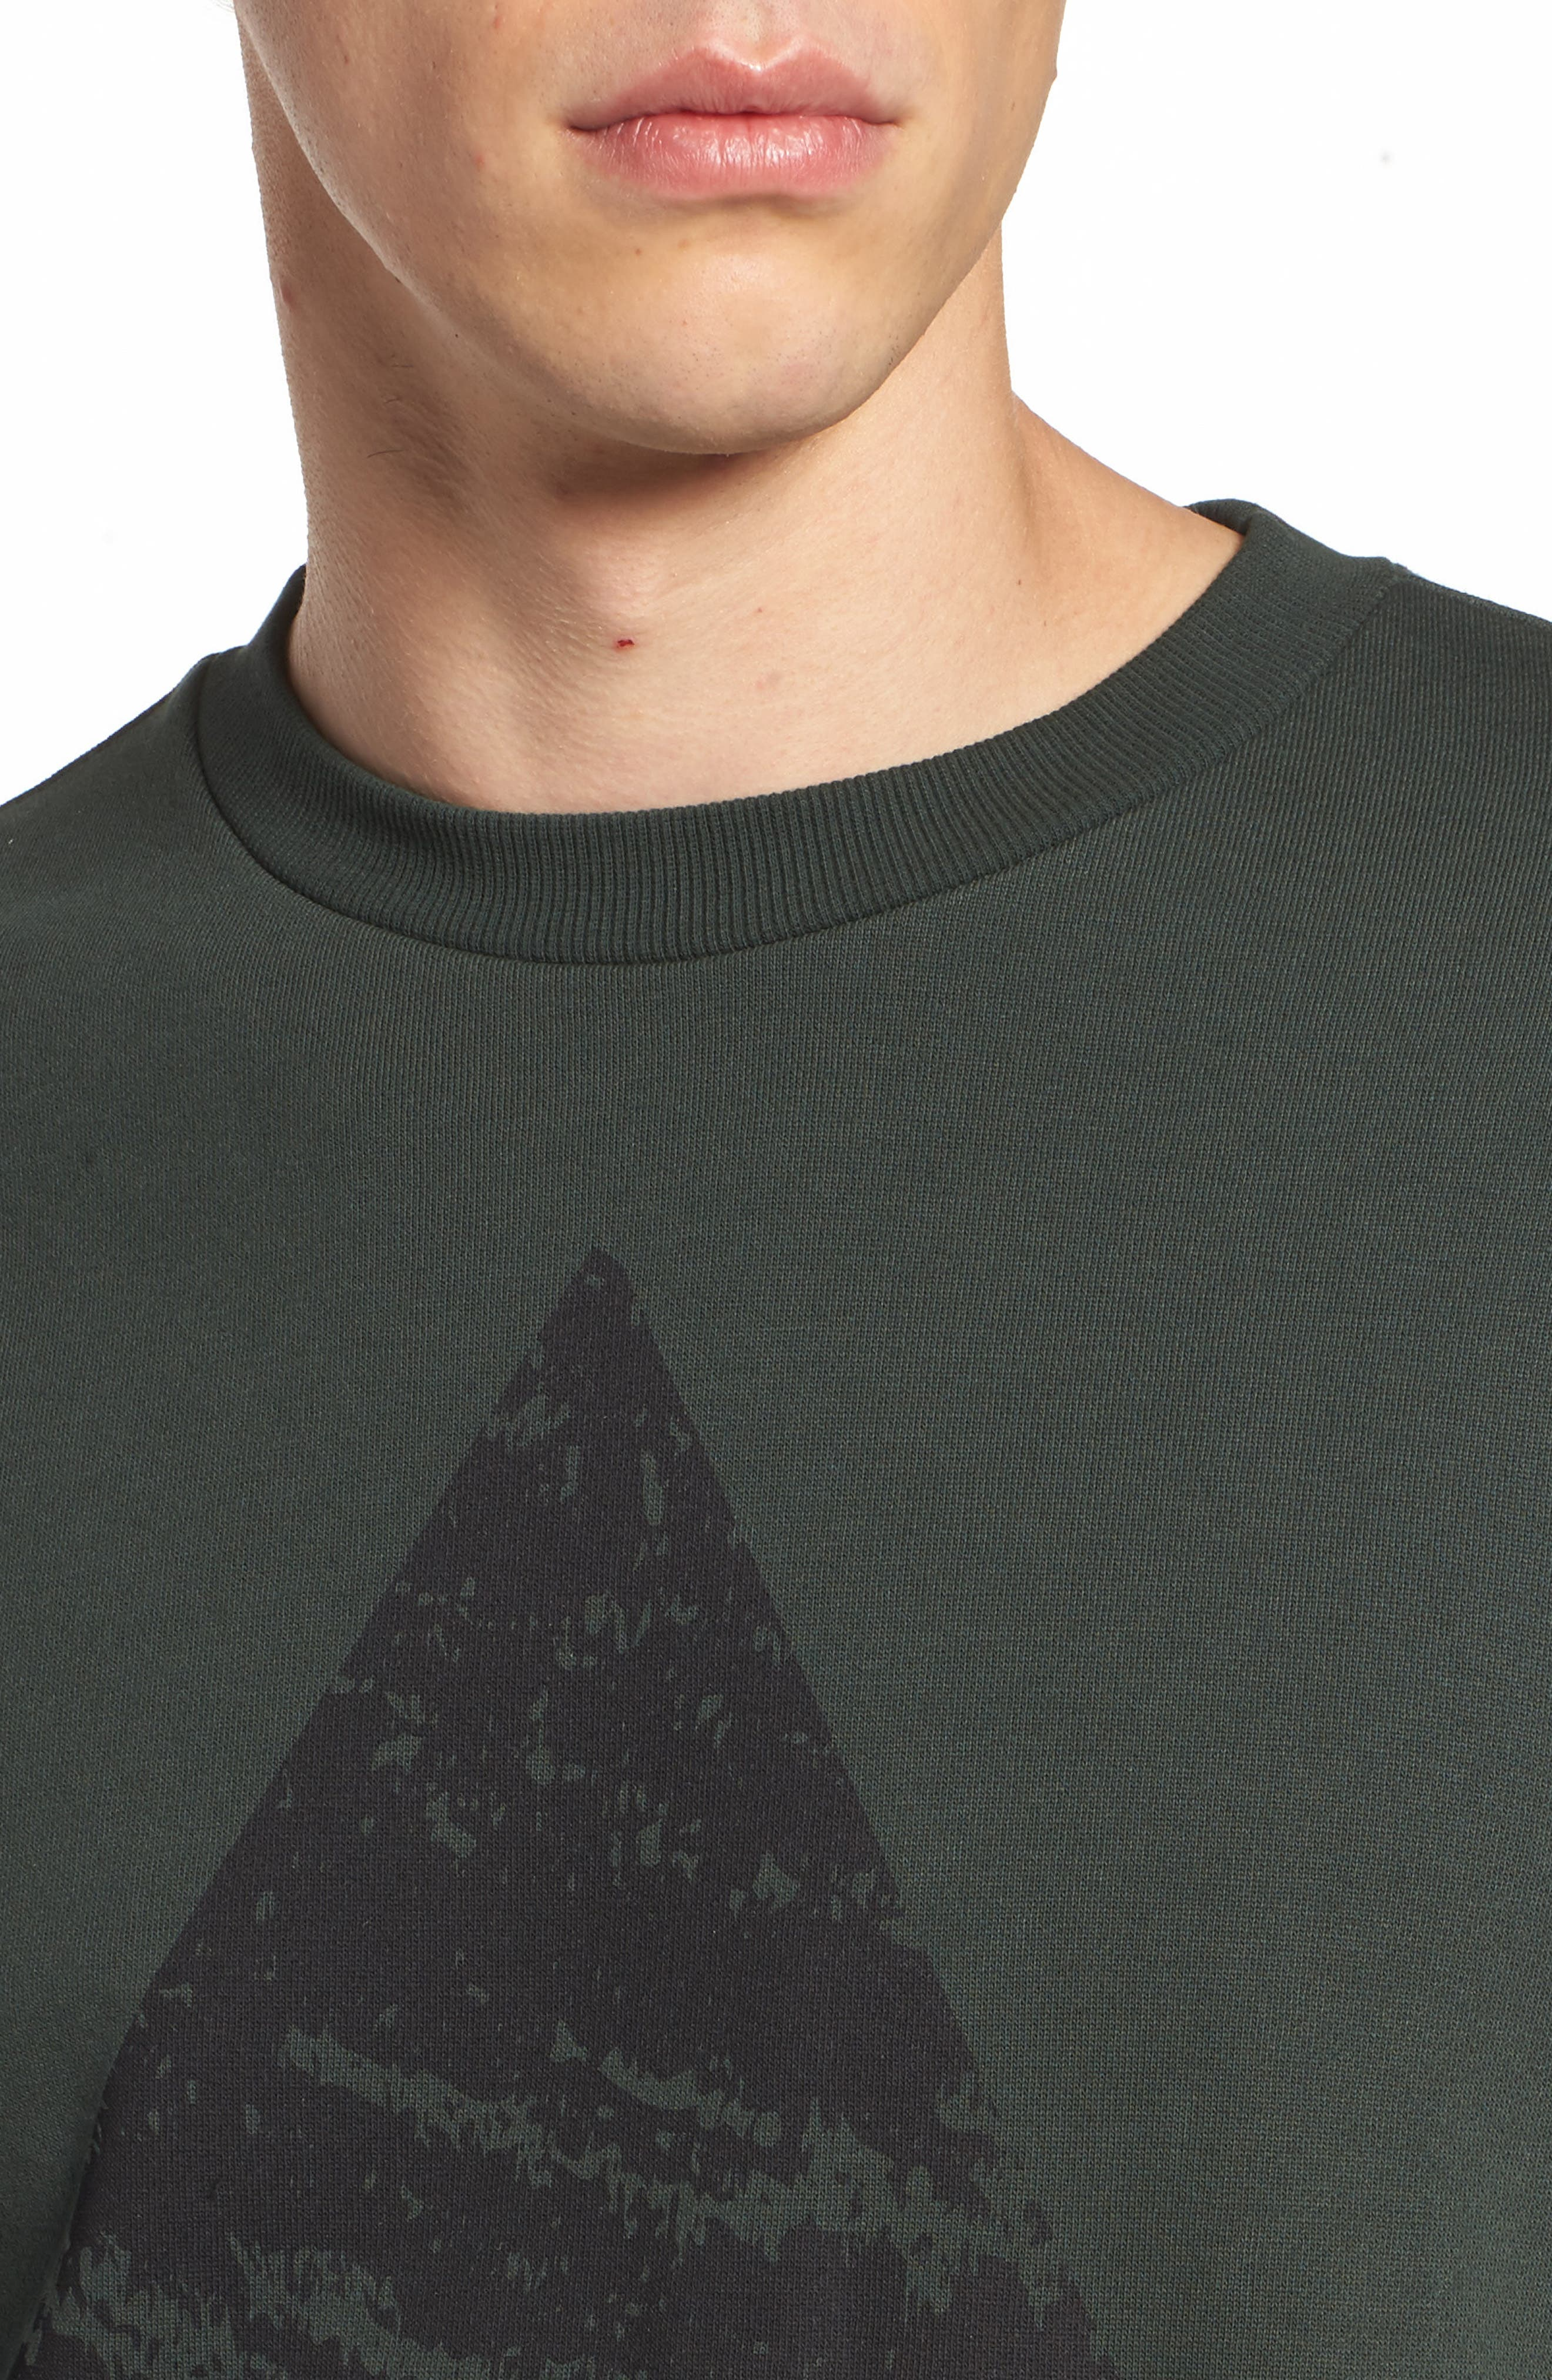 Adrian Sweatshirt,                             Alternate thumbnail 4, color,                             Green Mountain Peak